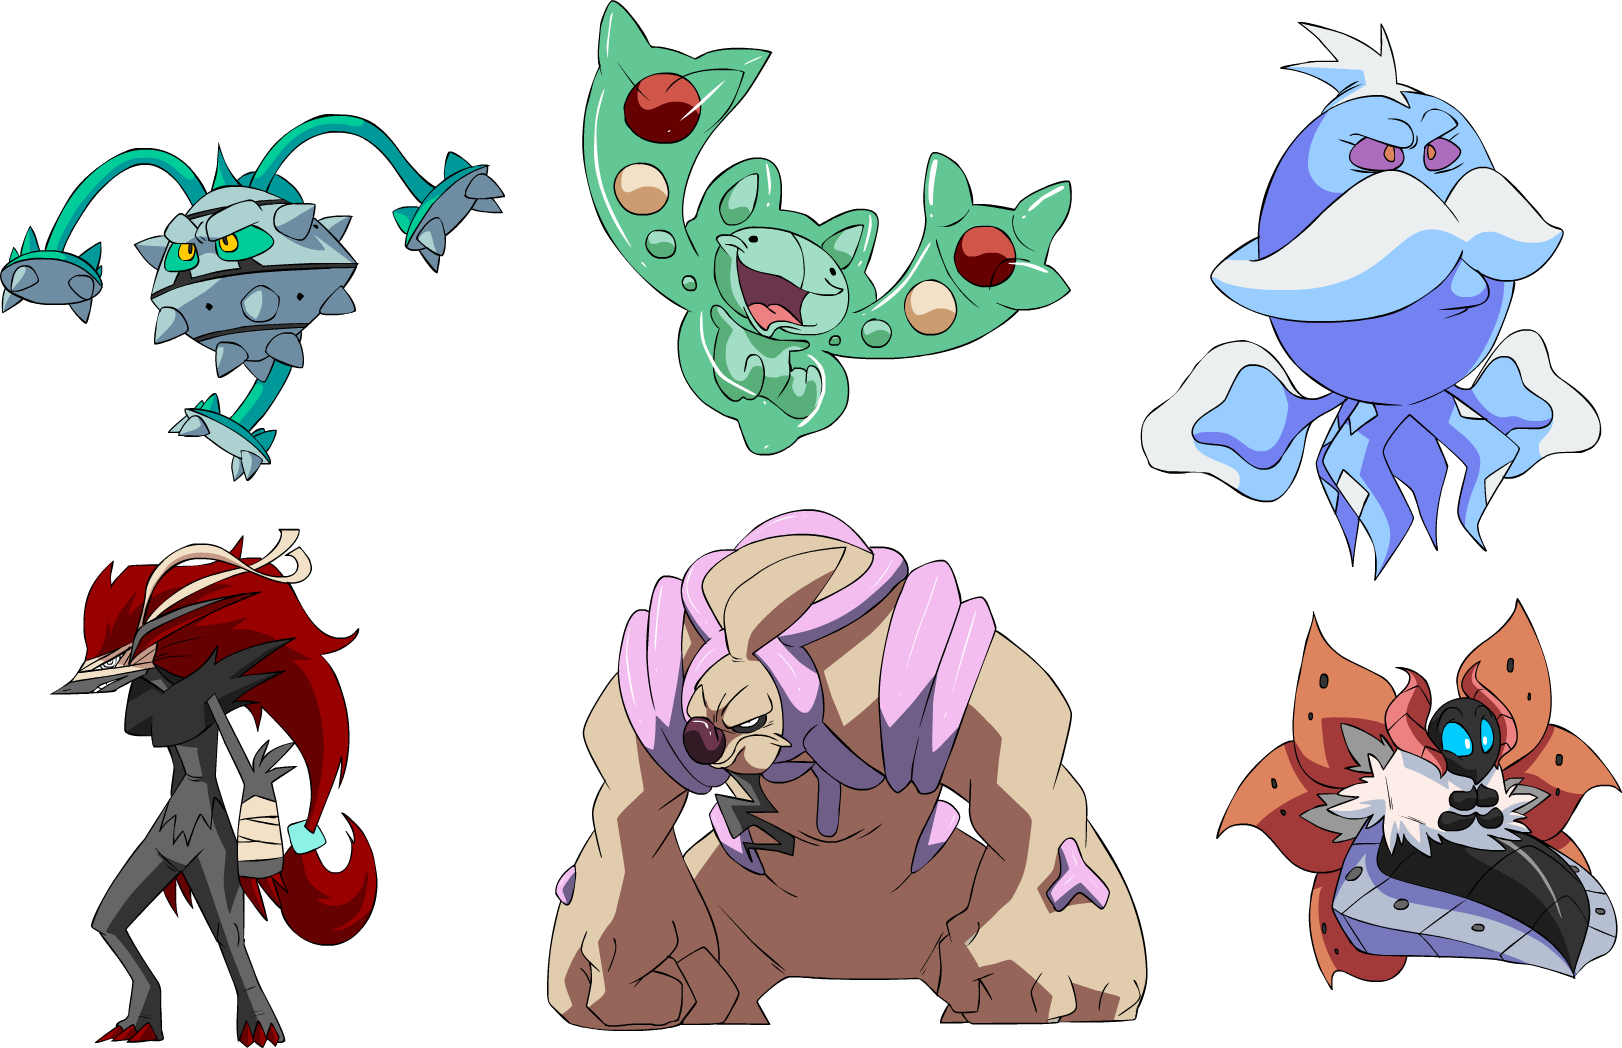 Pokemon x and y mega evolution all starters google search pokemon pokemon sun pokemon - Les mega evolution pokemon x et y ...